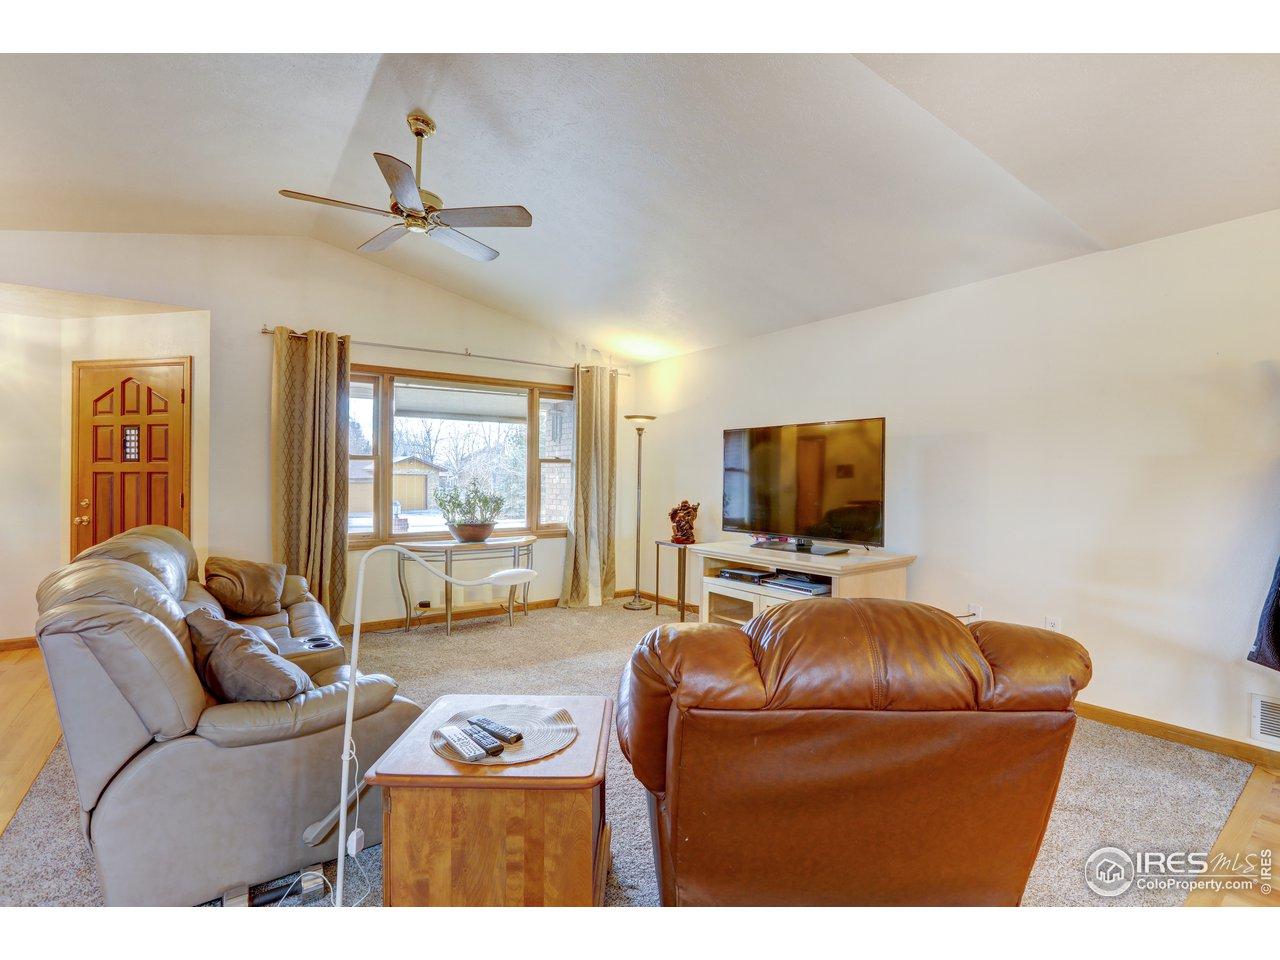 Livingroom has vaulted ceiling and bay window